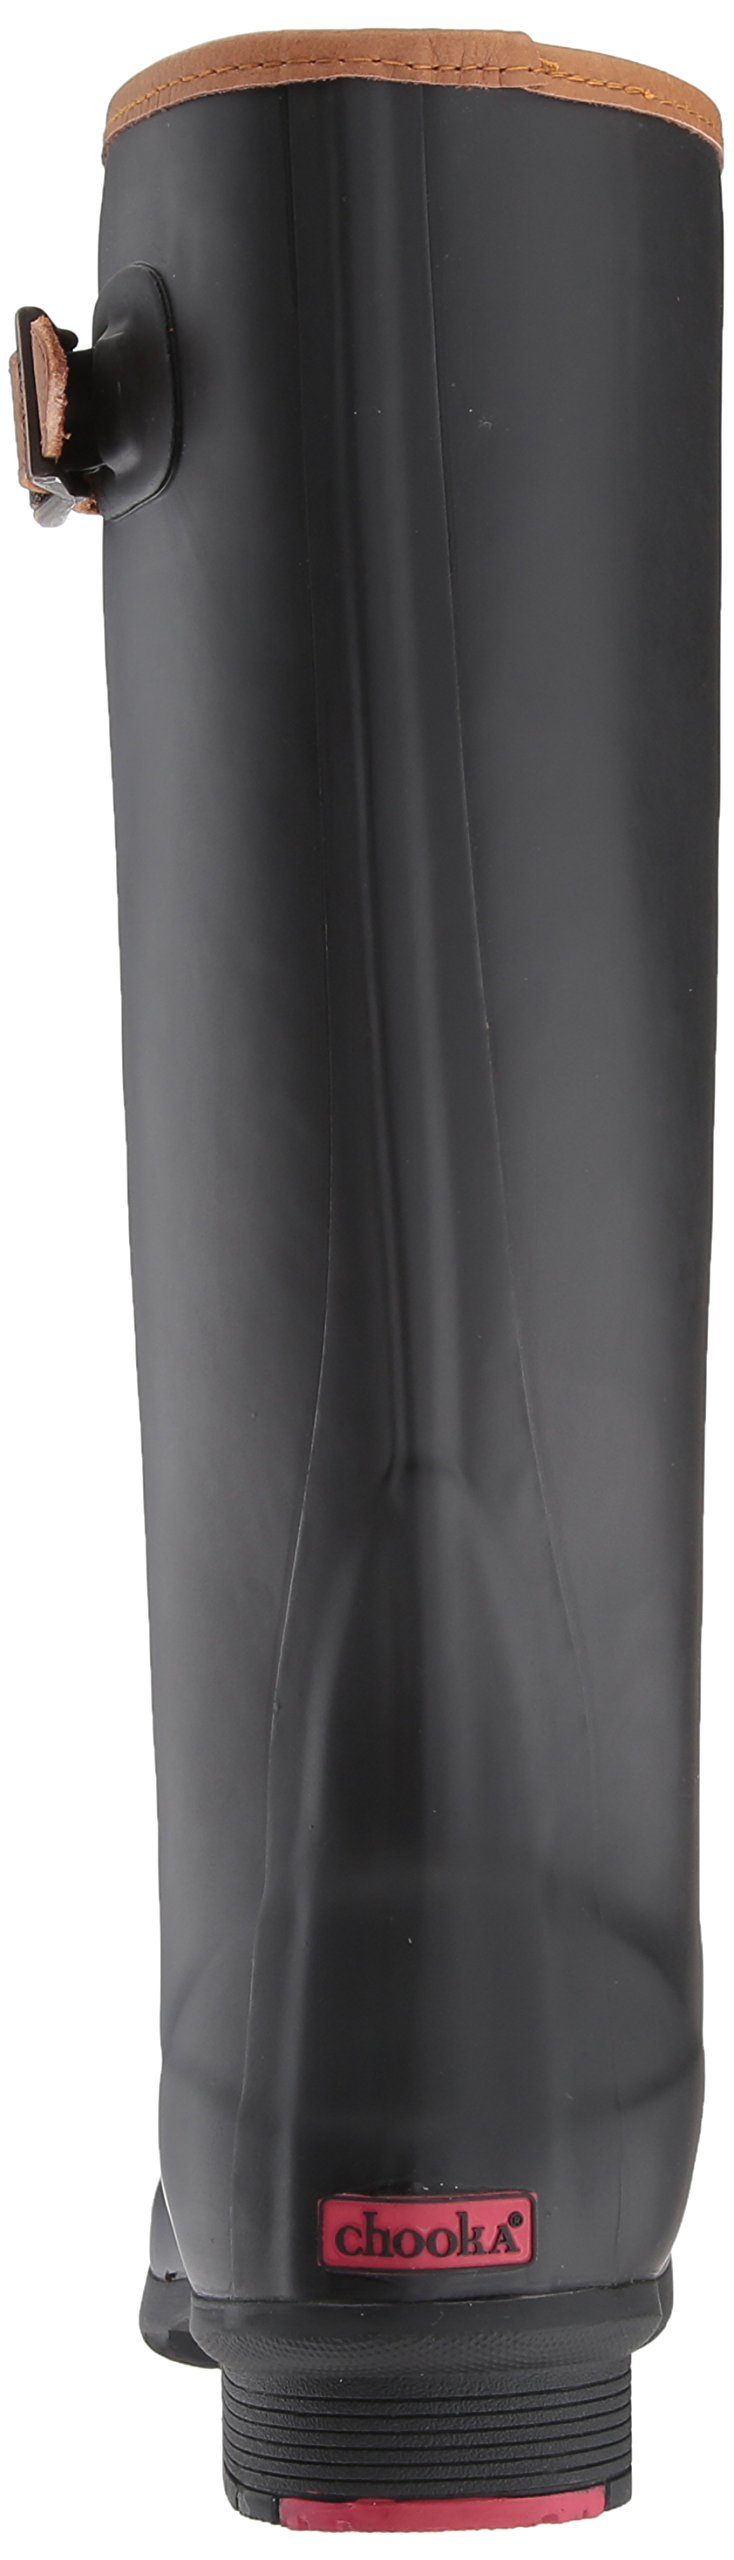 Chooka Women's Tall Memory Foam Rain Boot, Black, 7 M US by Chooka (Image #2)